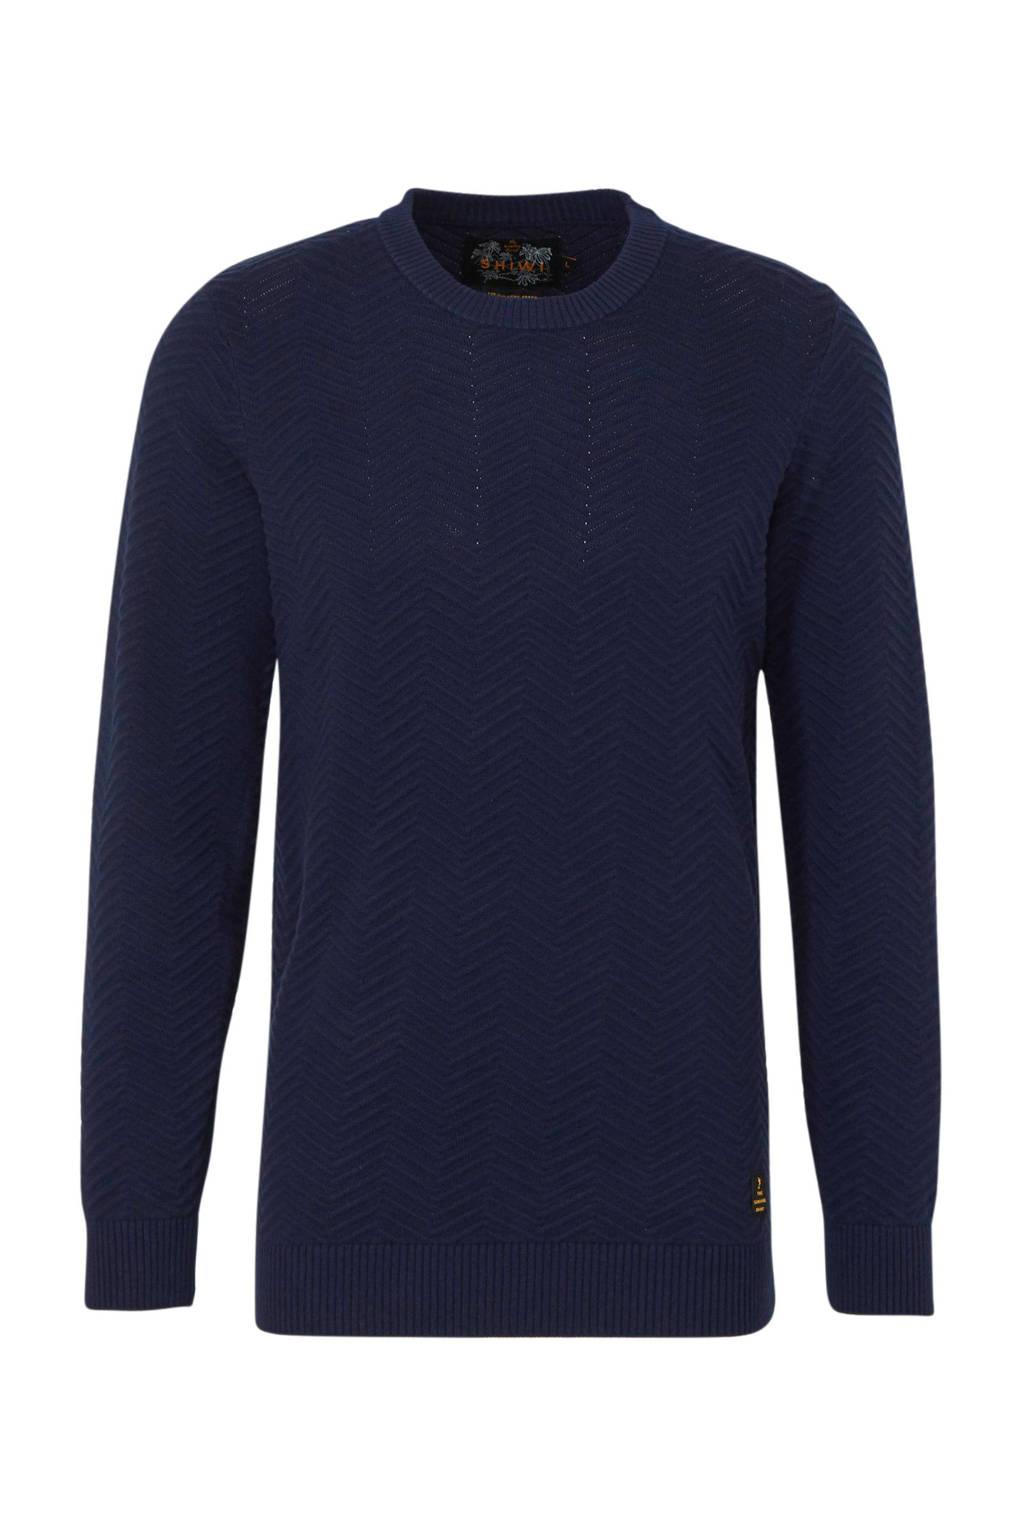 Shiwi trui donkerblauw, Donkerblauw